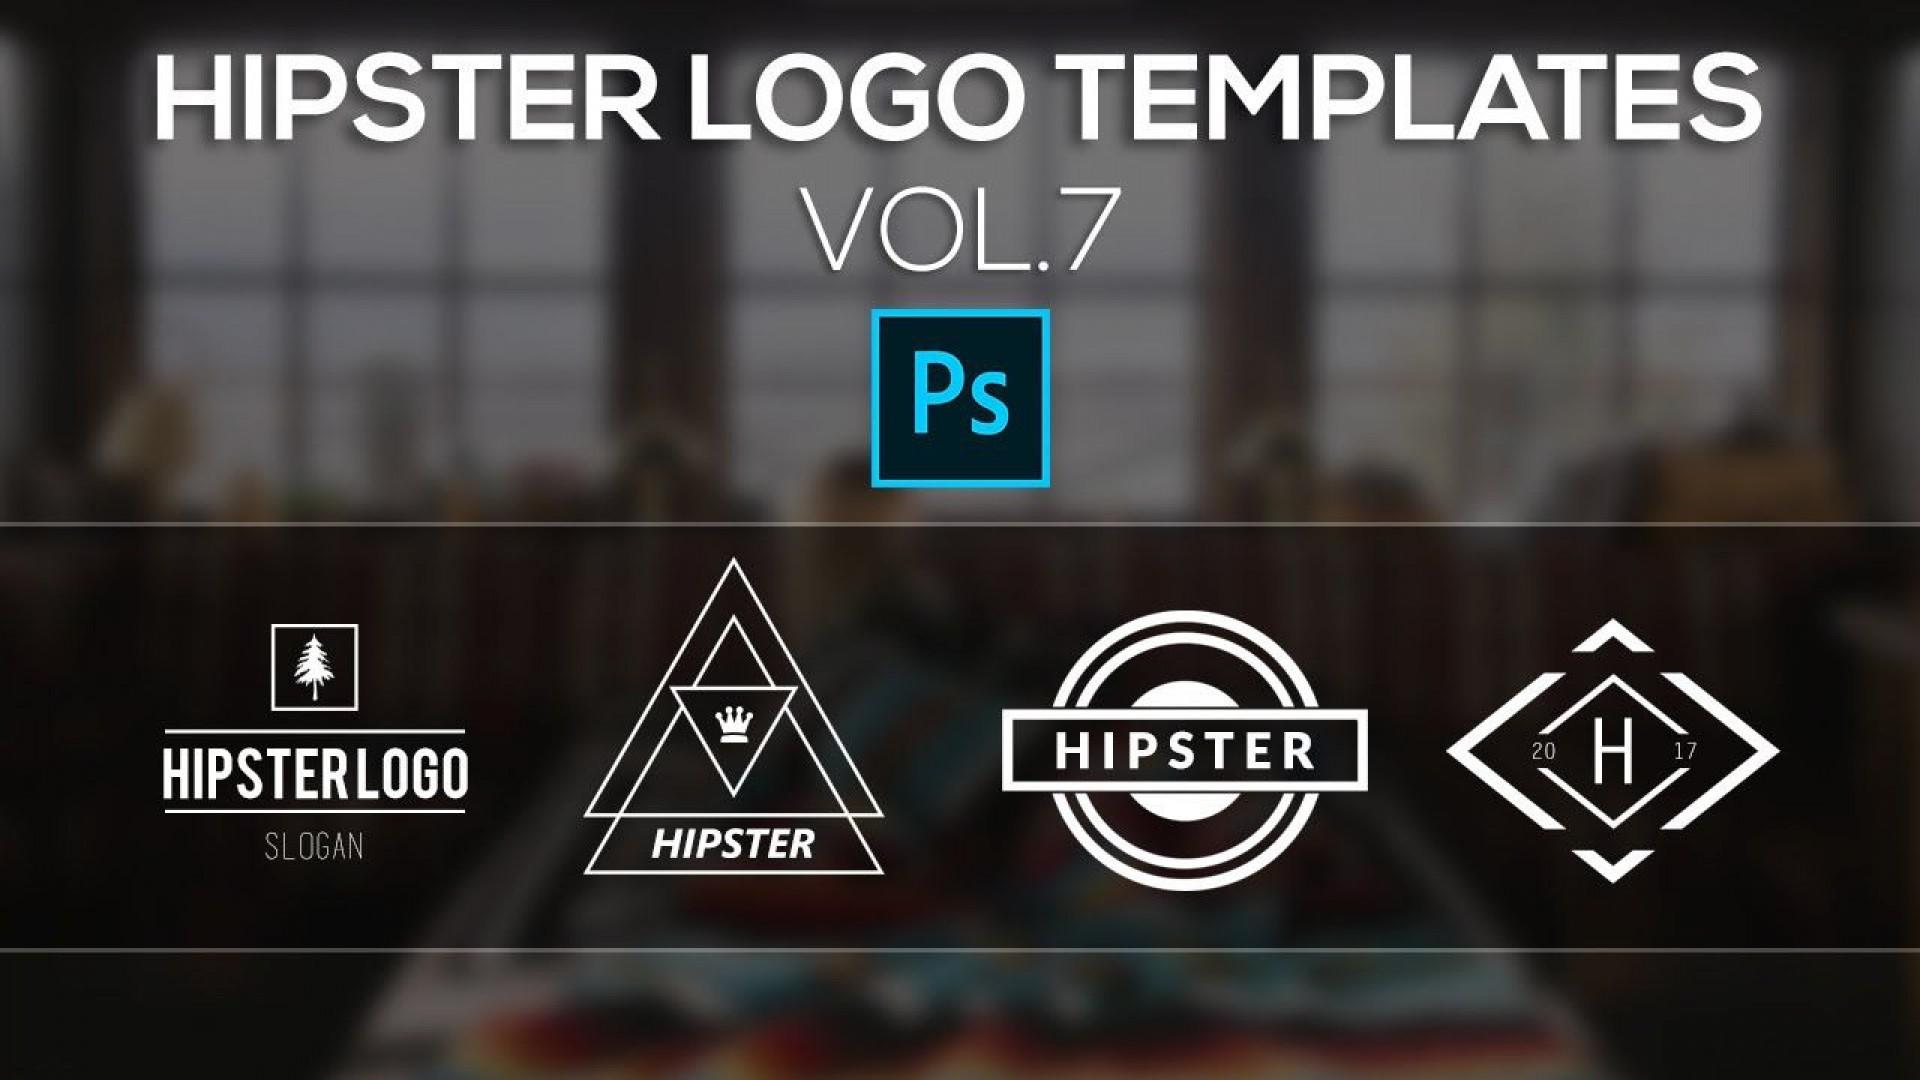 007 Stunning Free Logo Template Psd Highest Quality  Photoshop Mockup1920